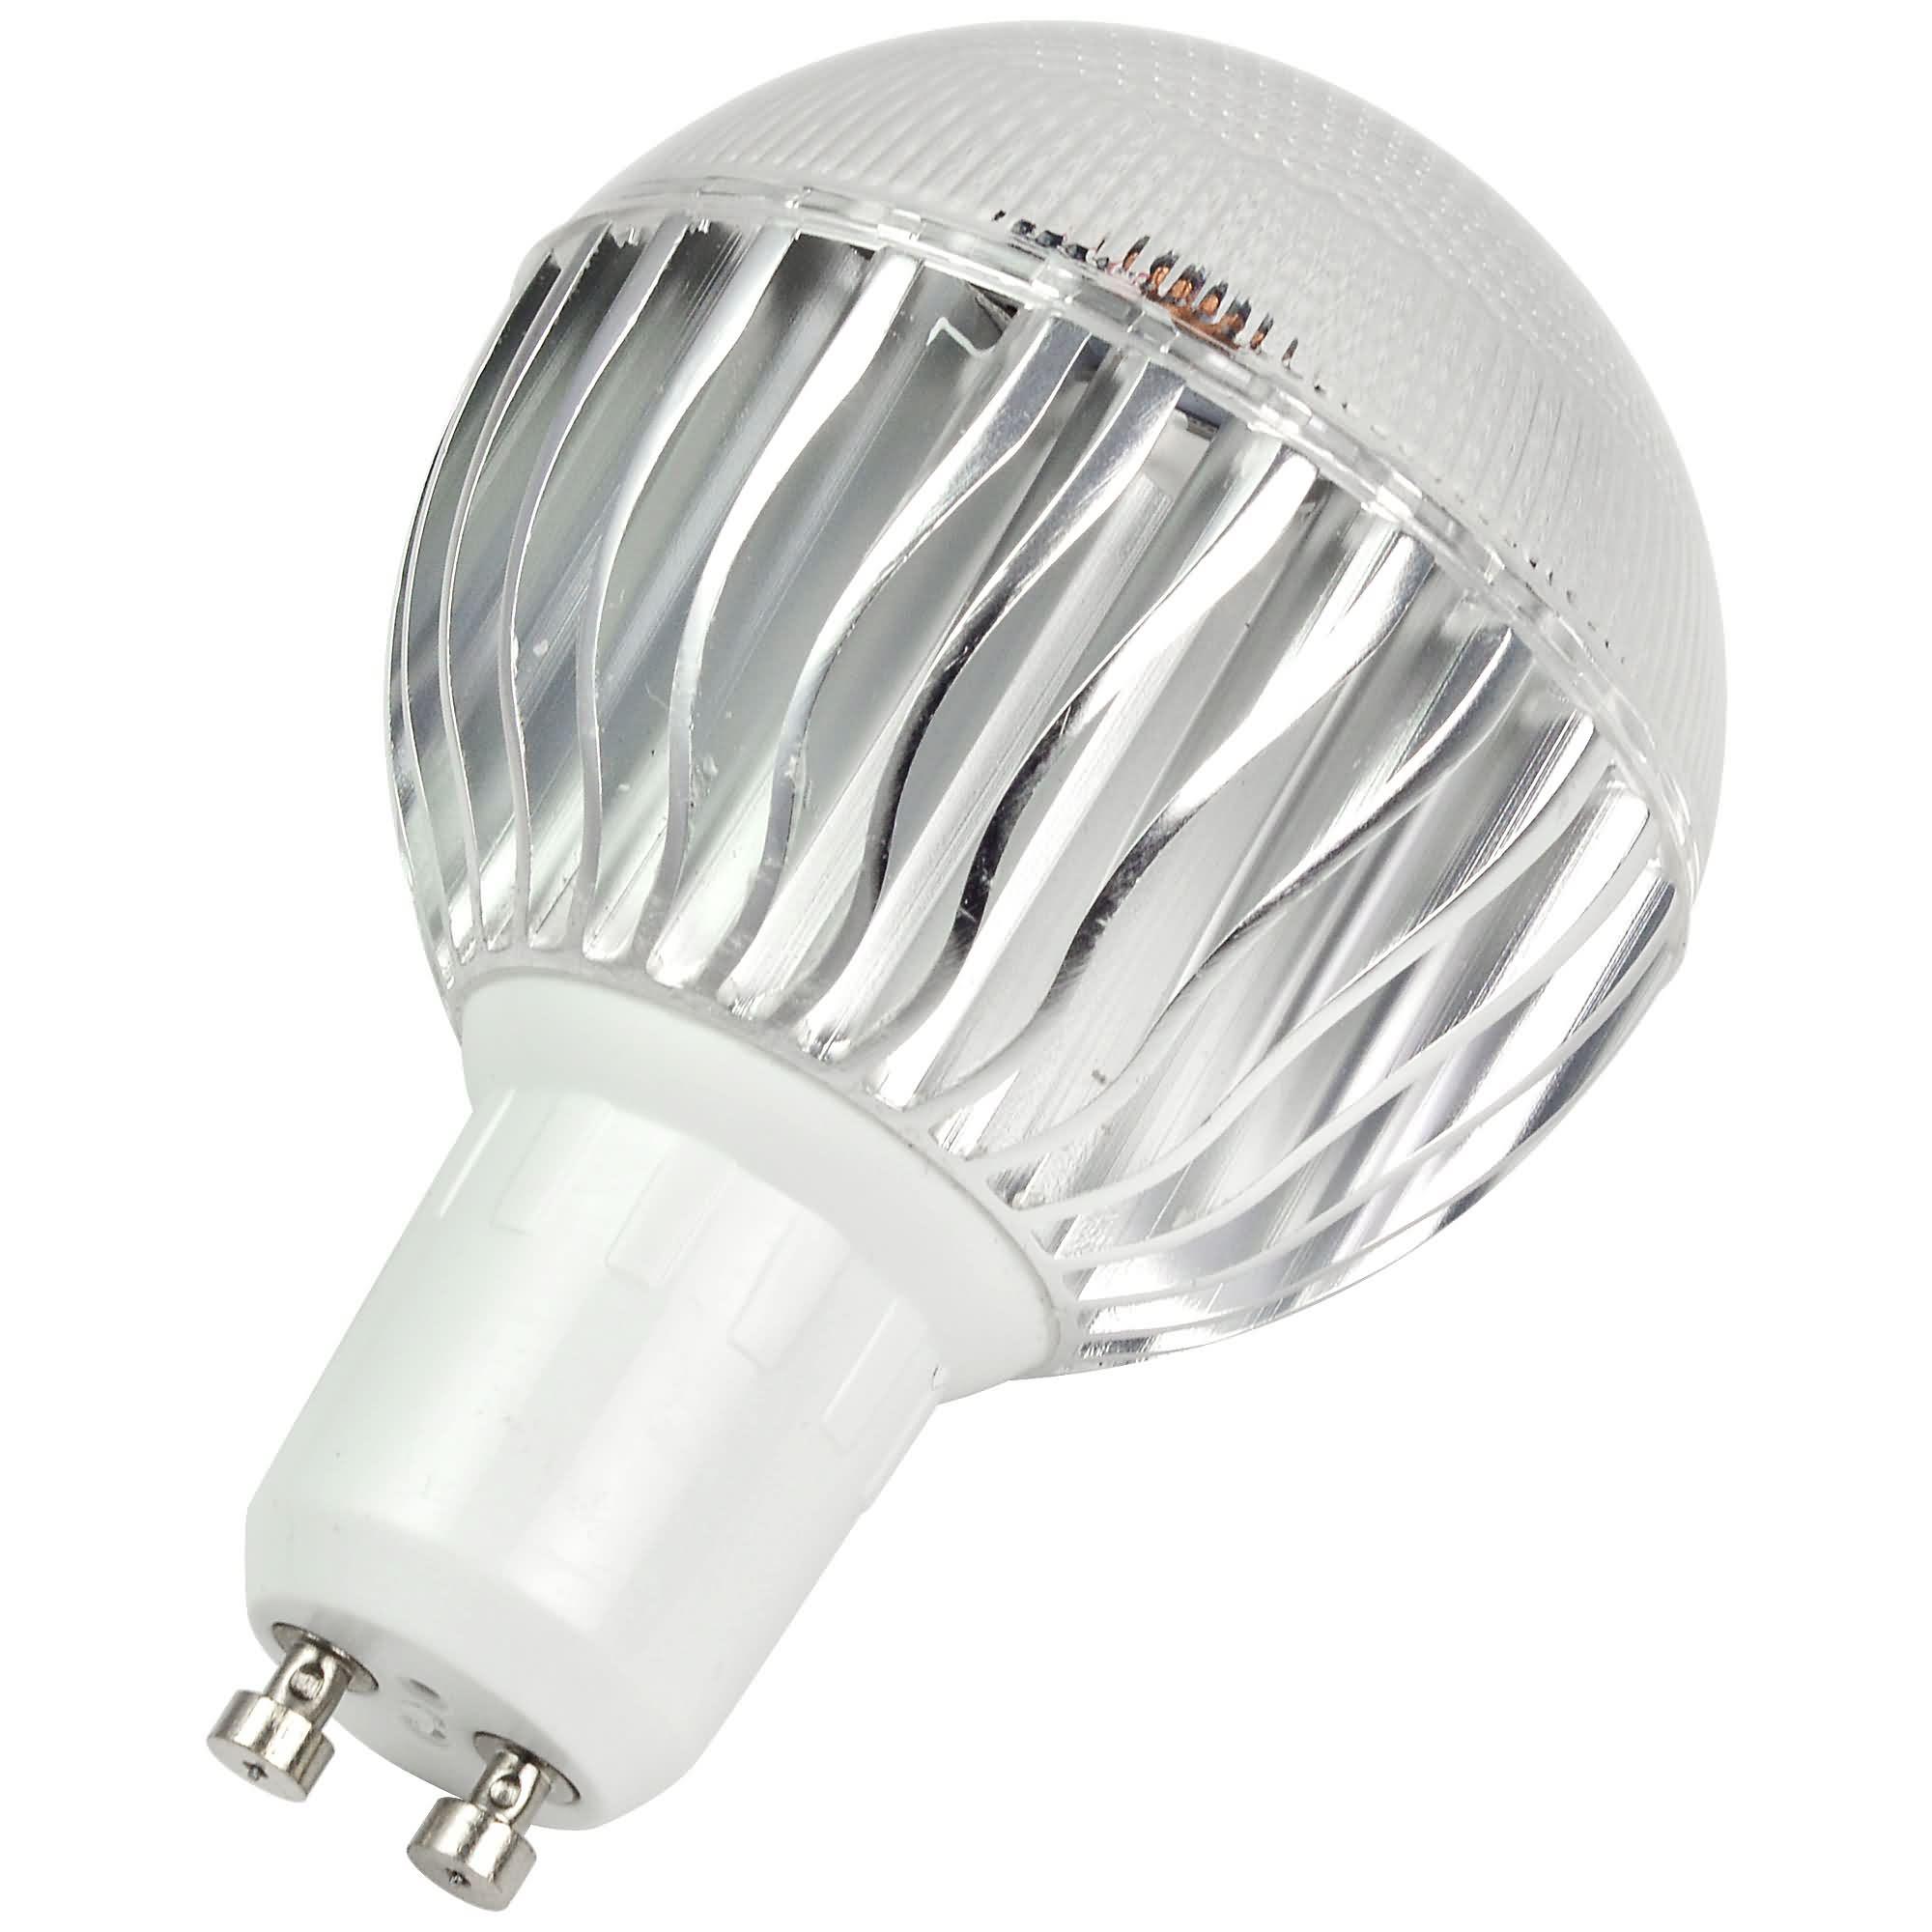 mengsled mengs gu10 8w led rgb light 16 colour changing smd leds led globe lamp bulb with ir. Black Bedroom Furniture Sets. Home Design Ideas